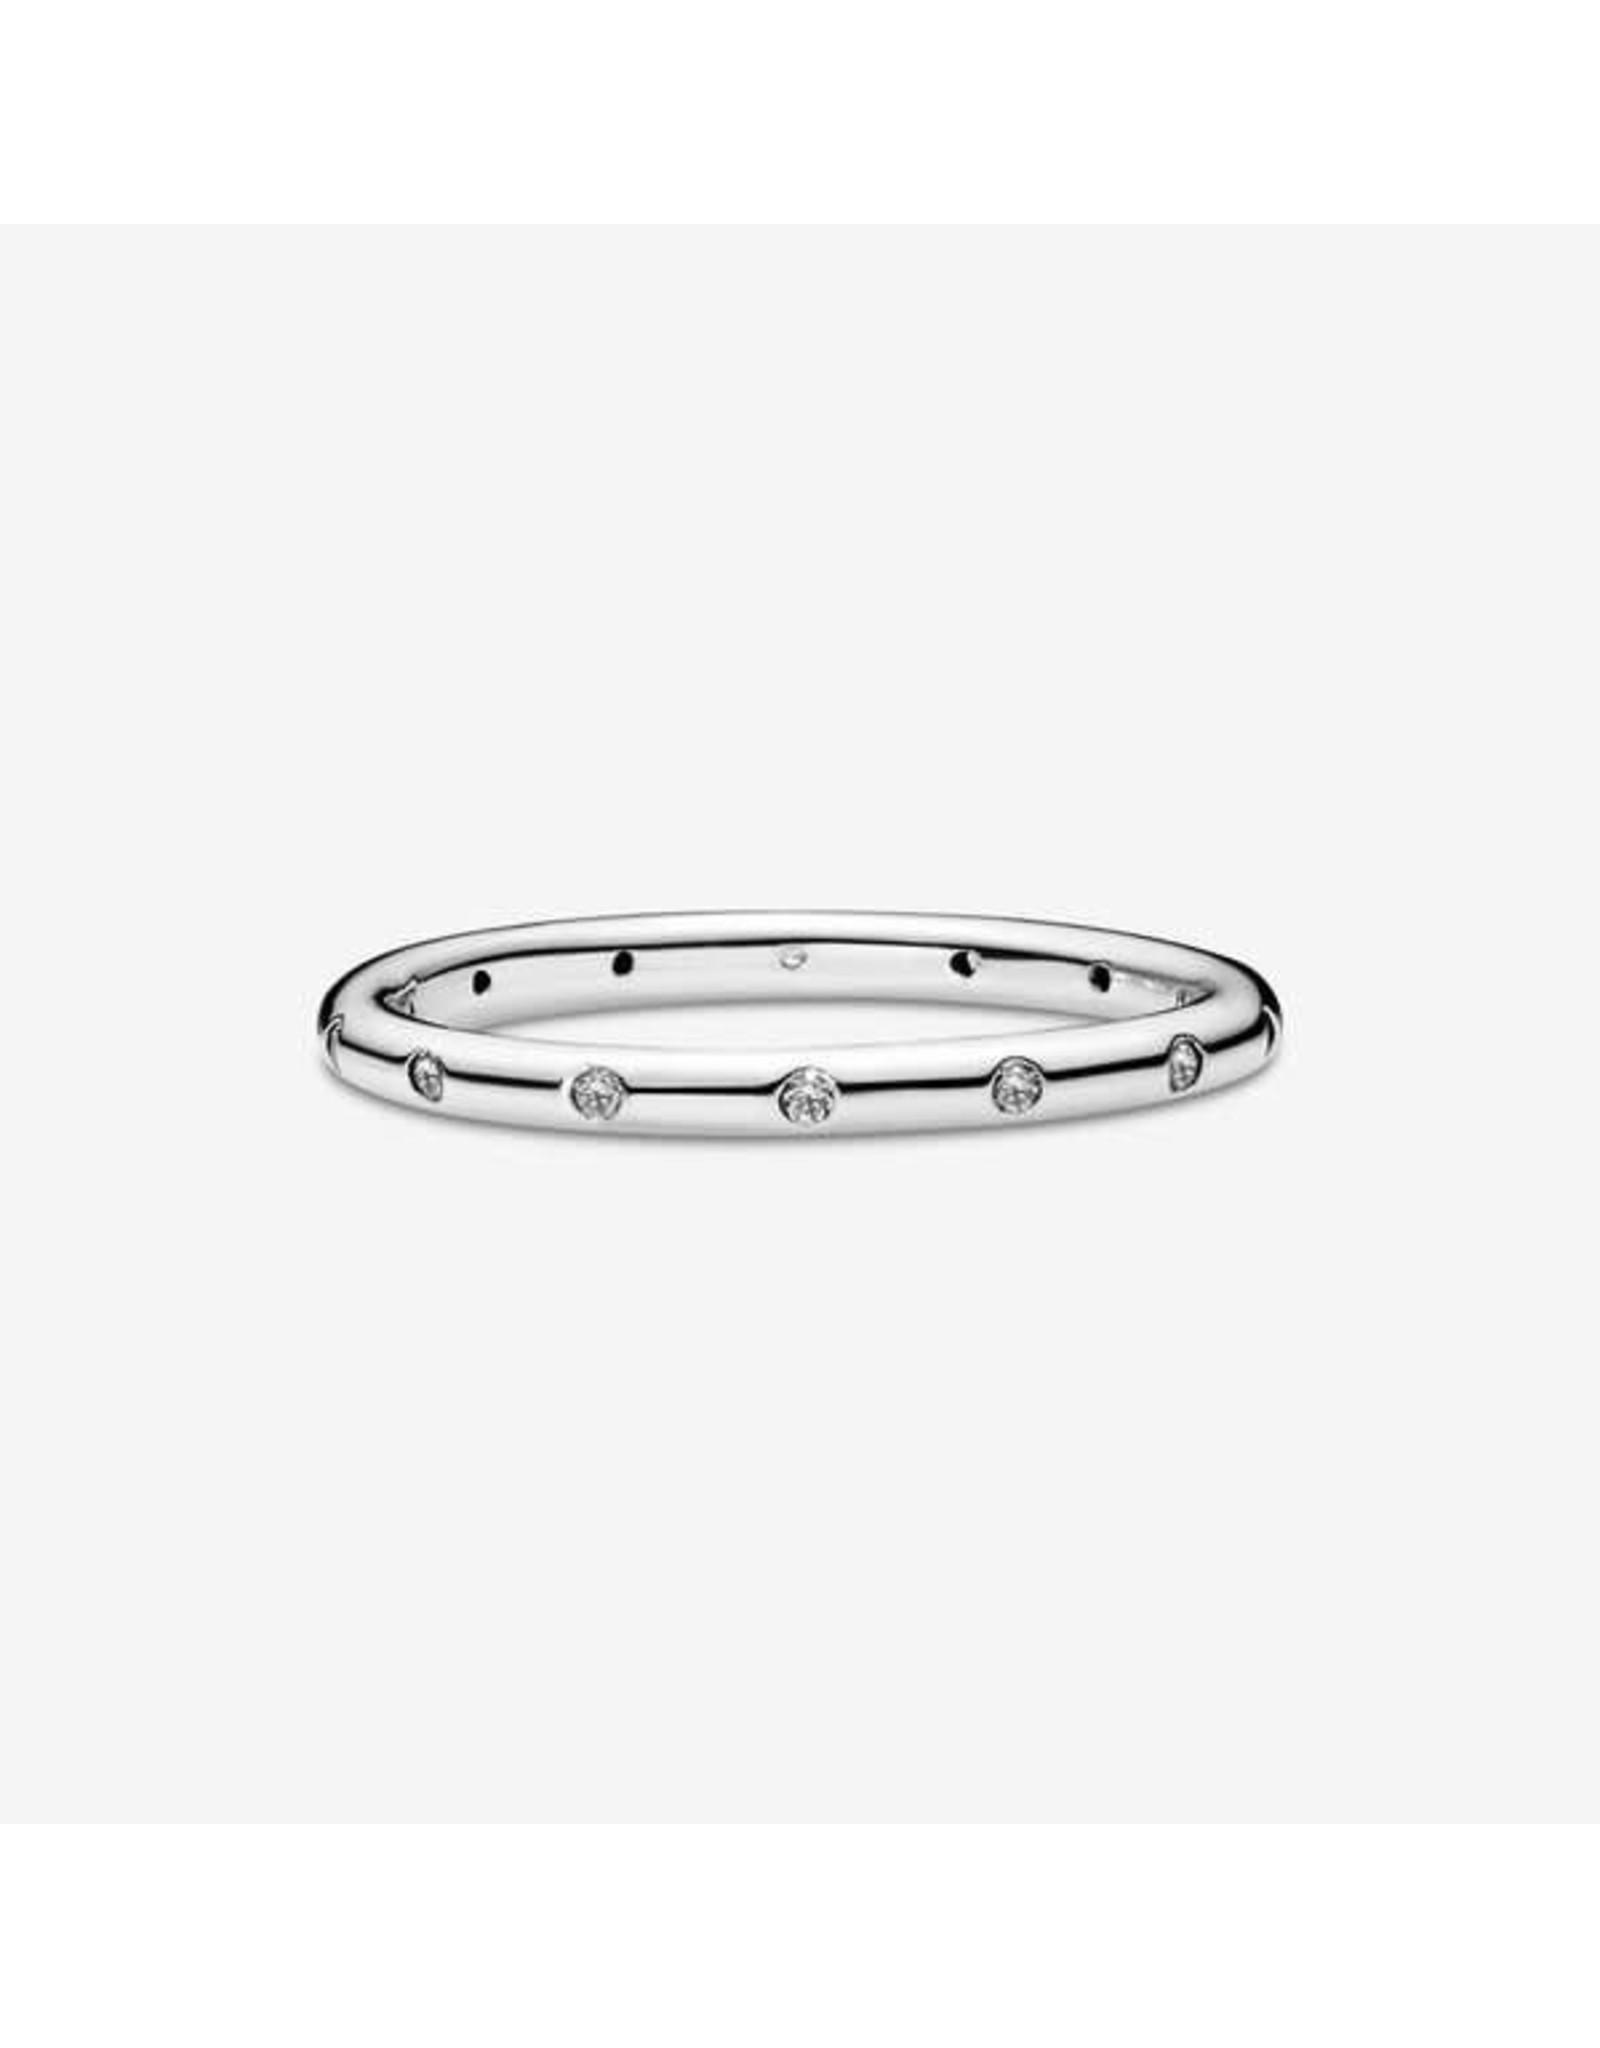 Pandora Pandora Ring, 190945CZ.Droplets, Clear CZ